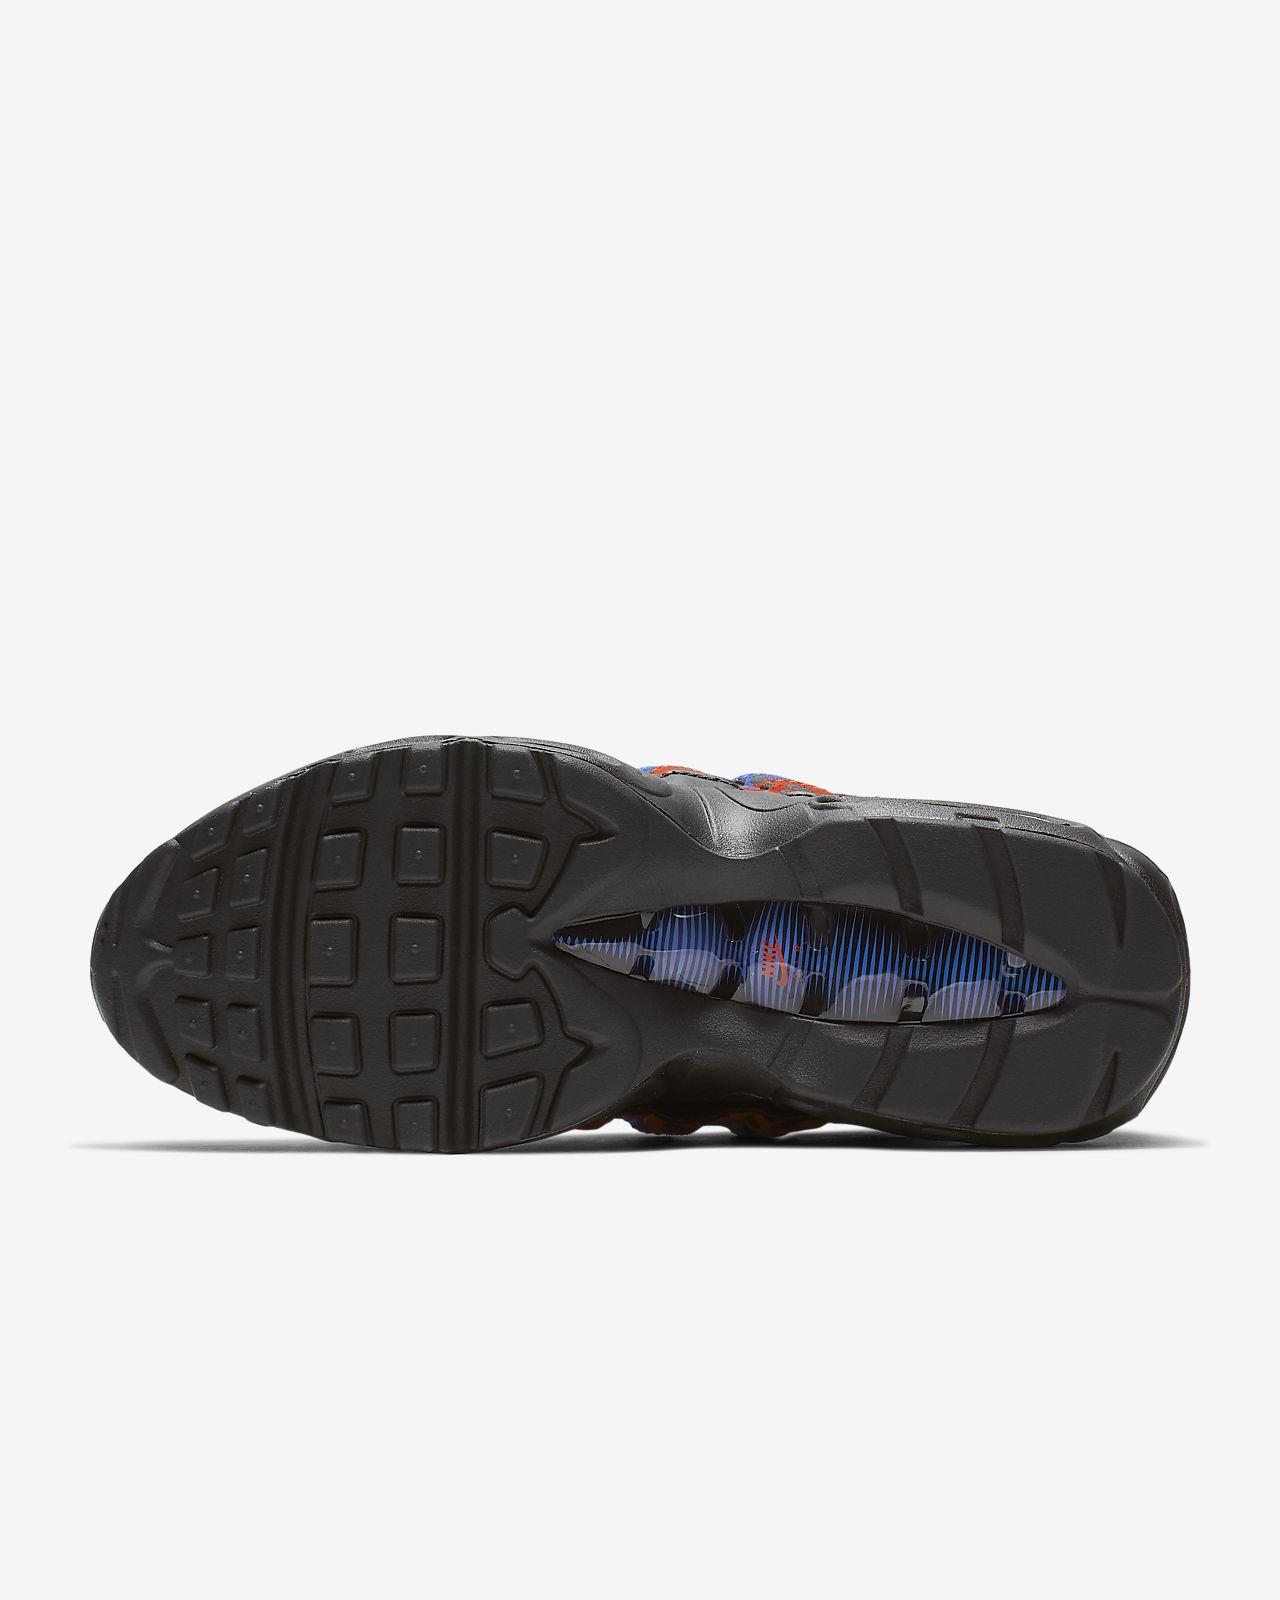 18e42c61b1c Nike Air Max 95 Premium Animal Women s Shoe. Nike.com GB